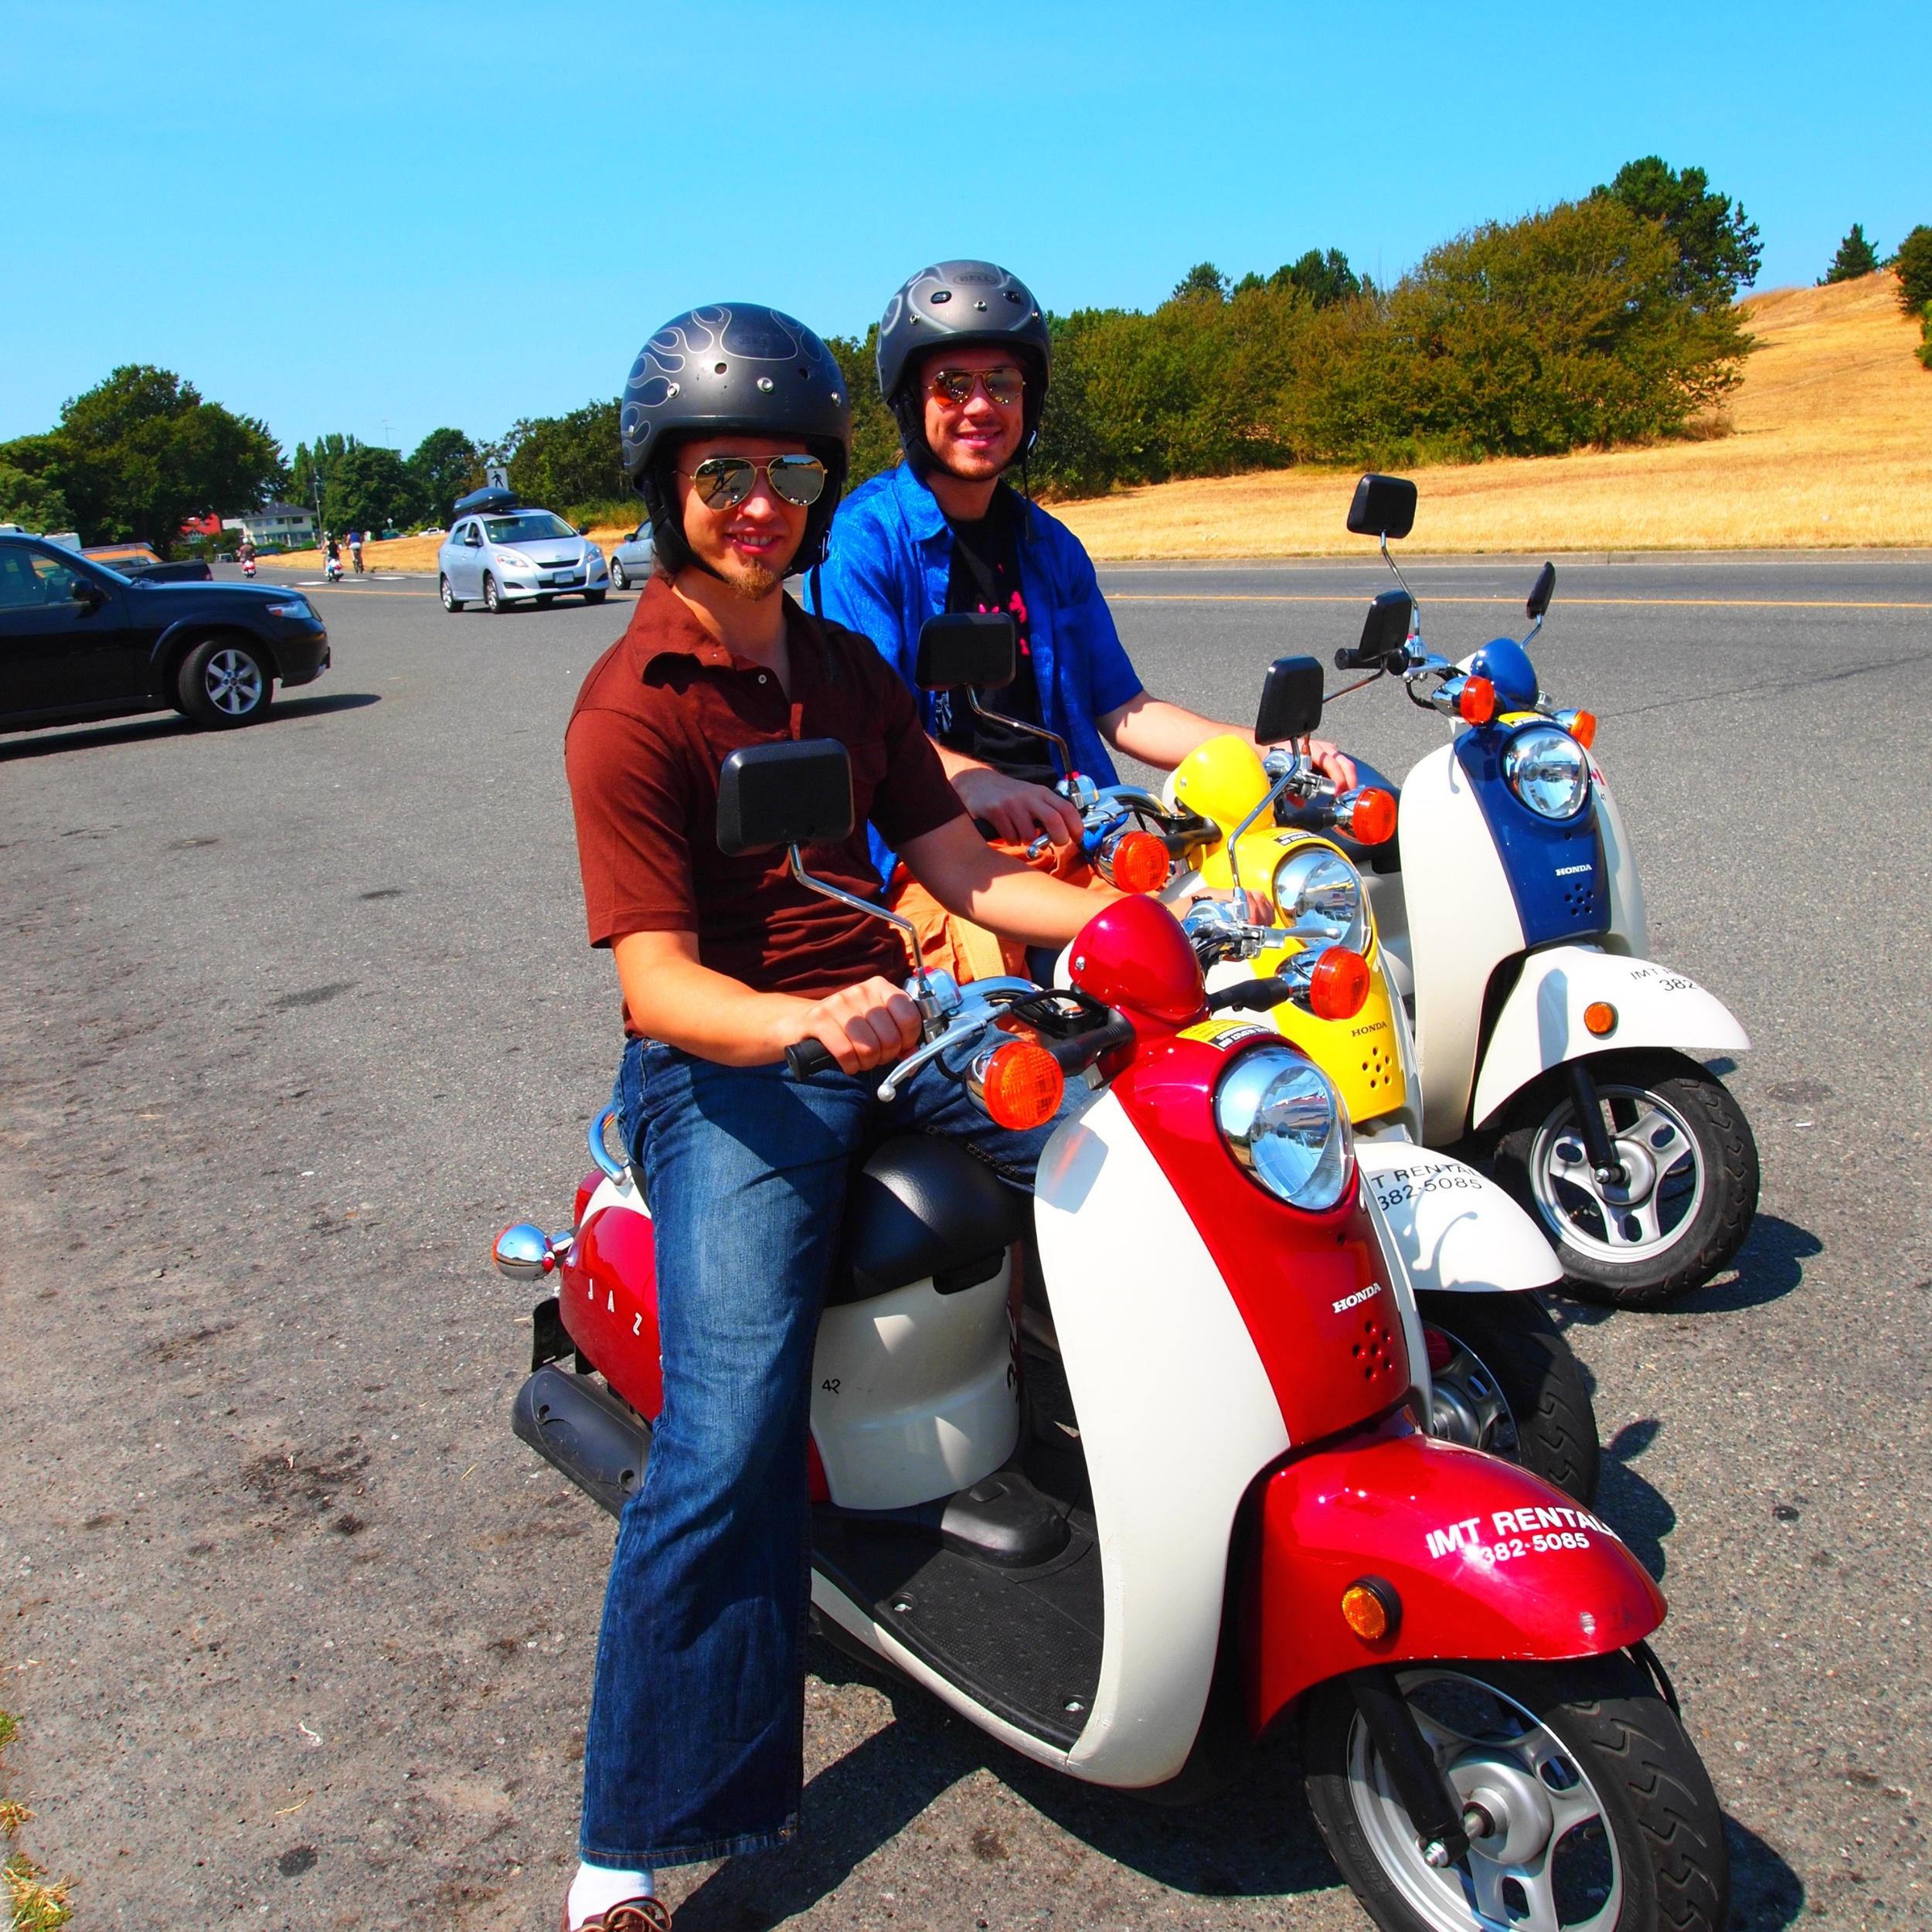 Scooter Ride 3.jpg